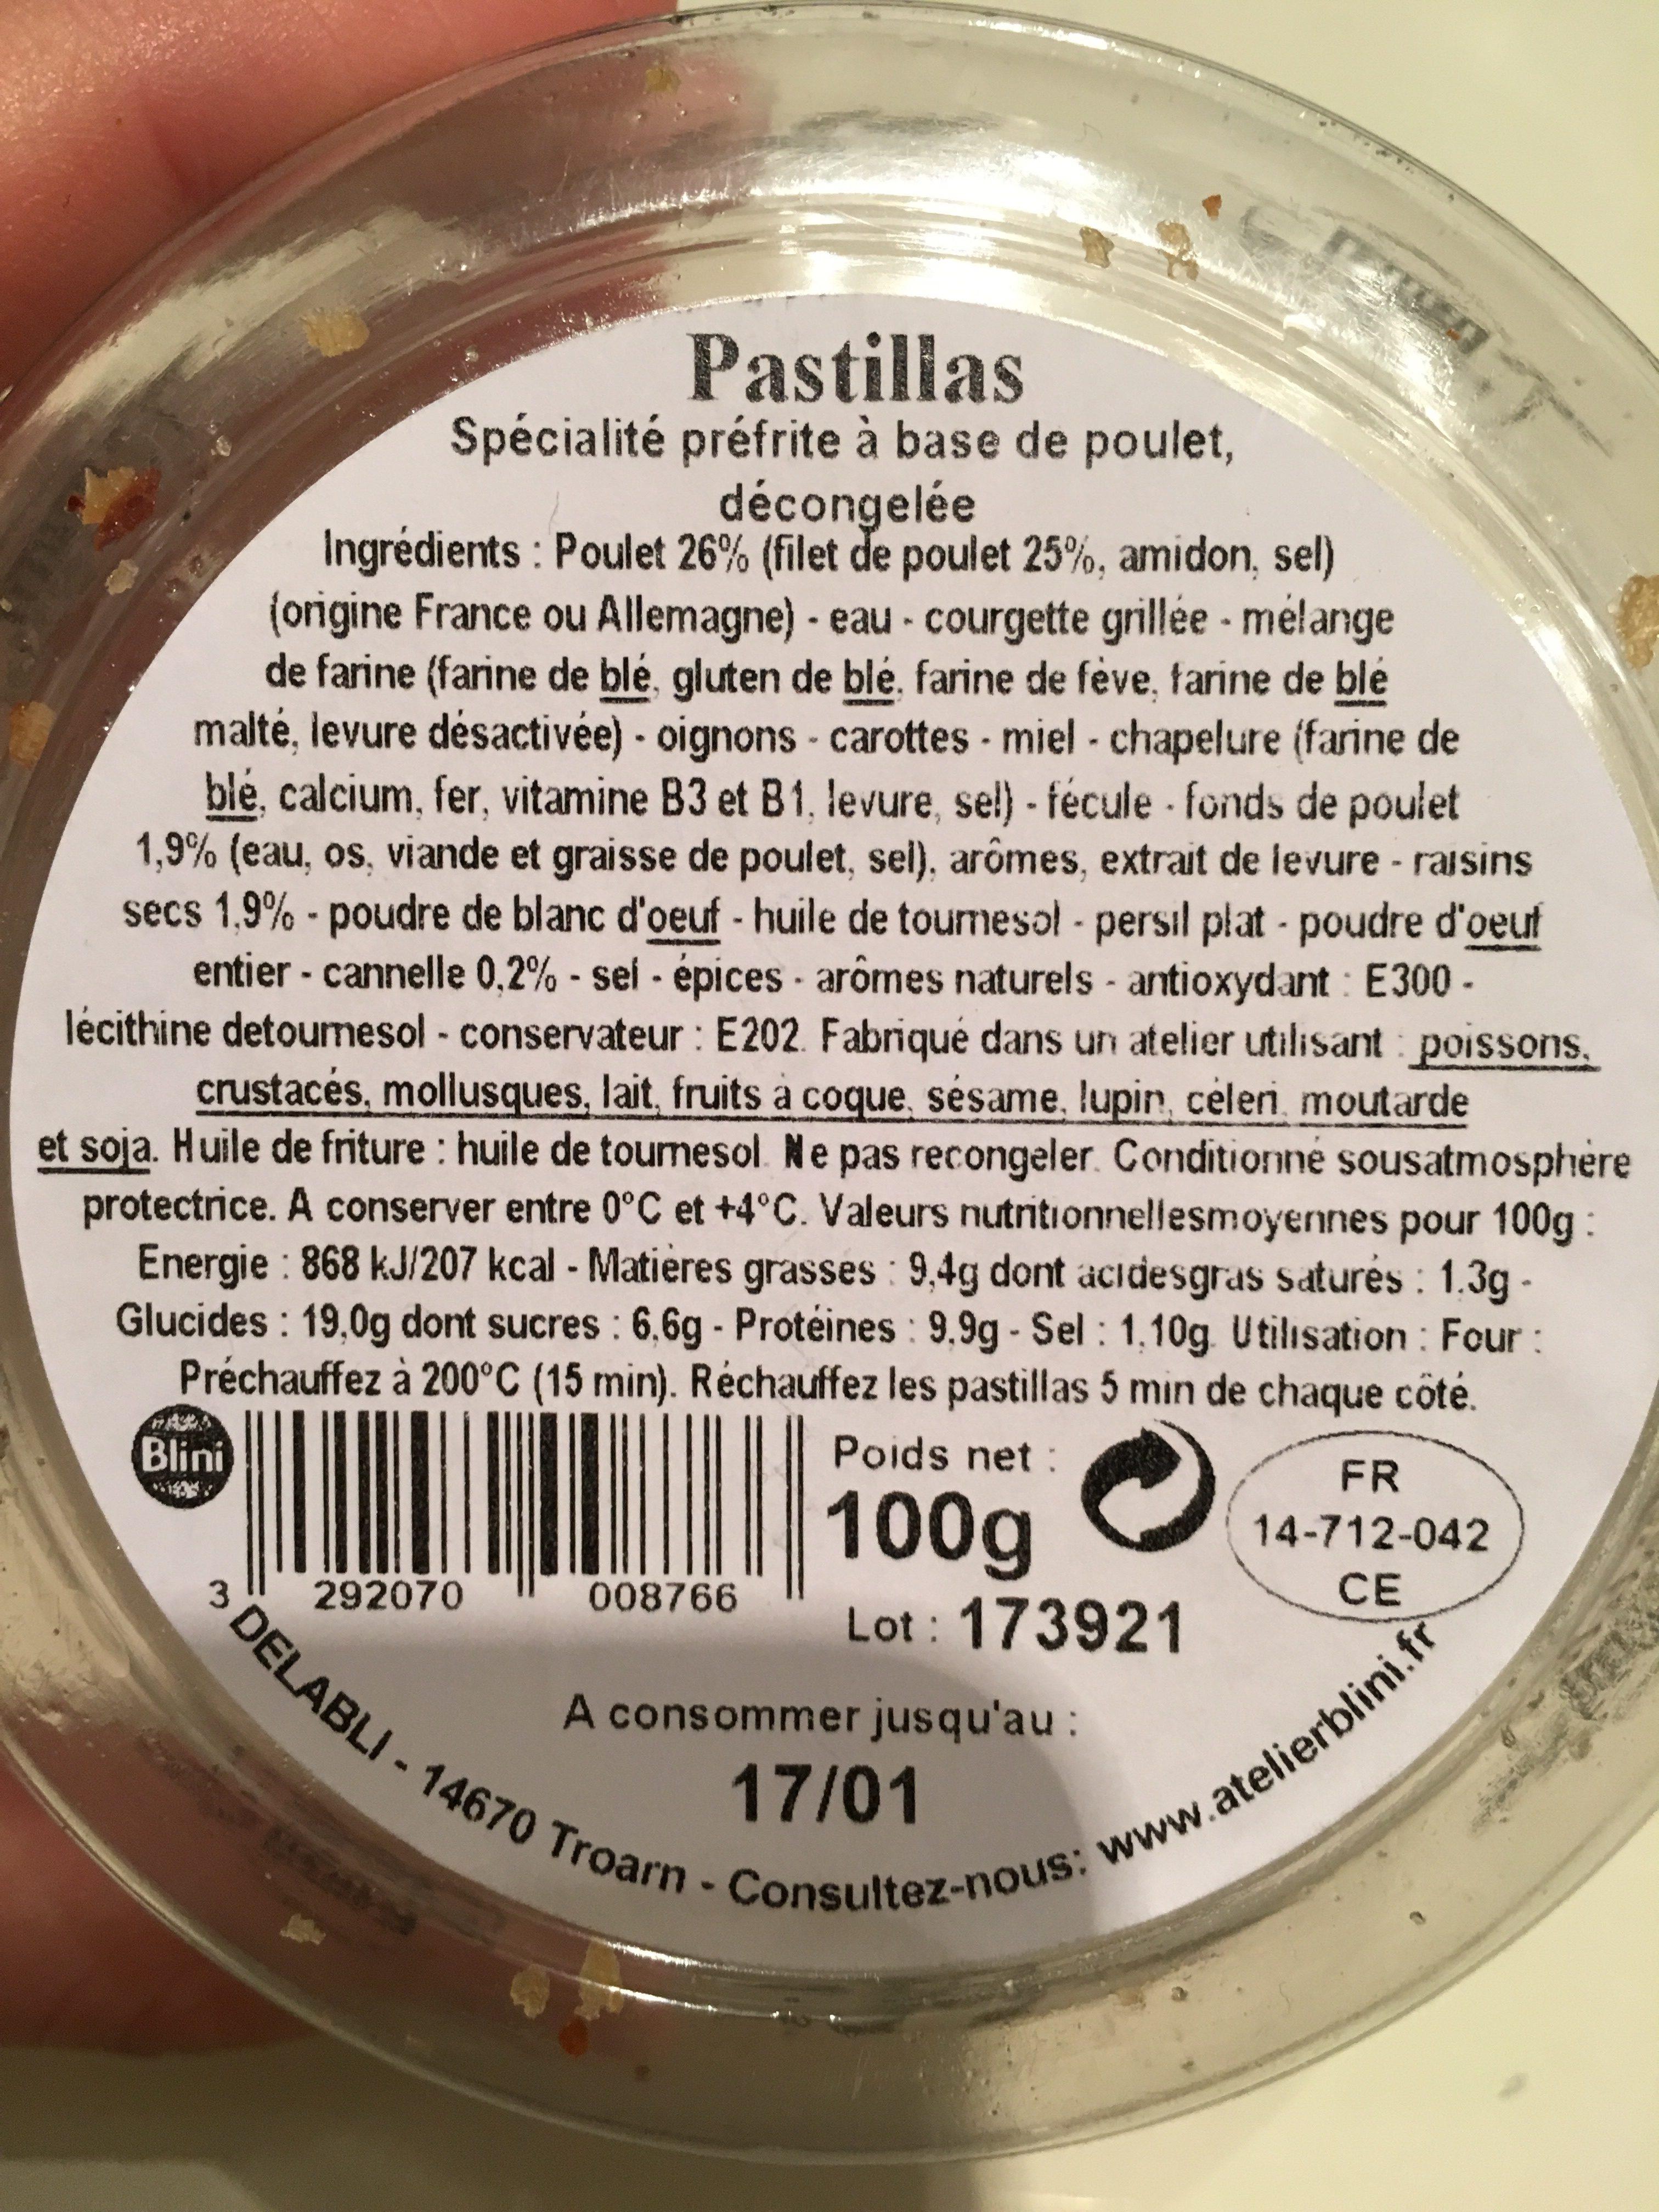 Pastillas - Ingrédients